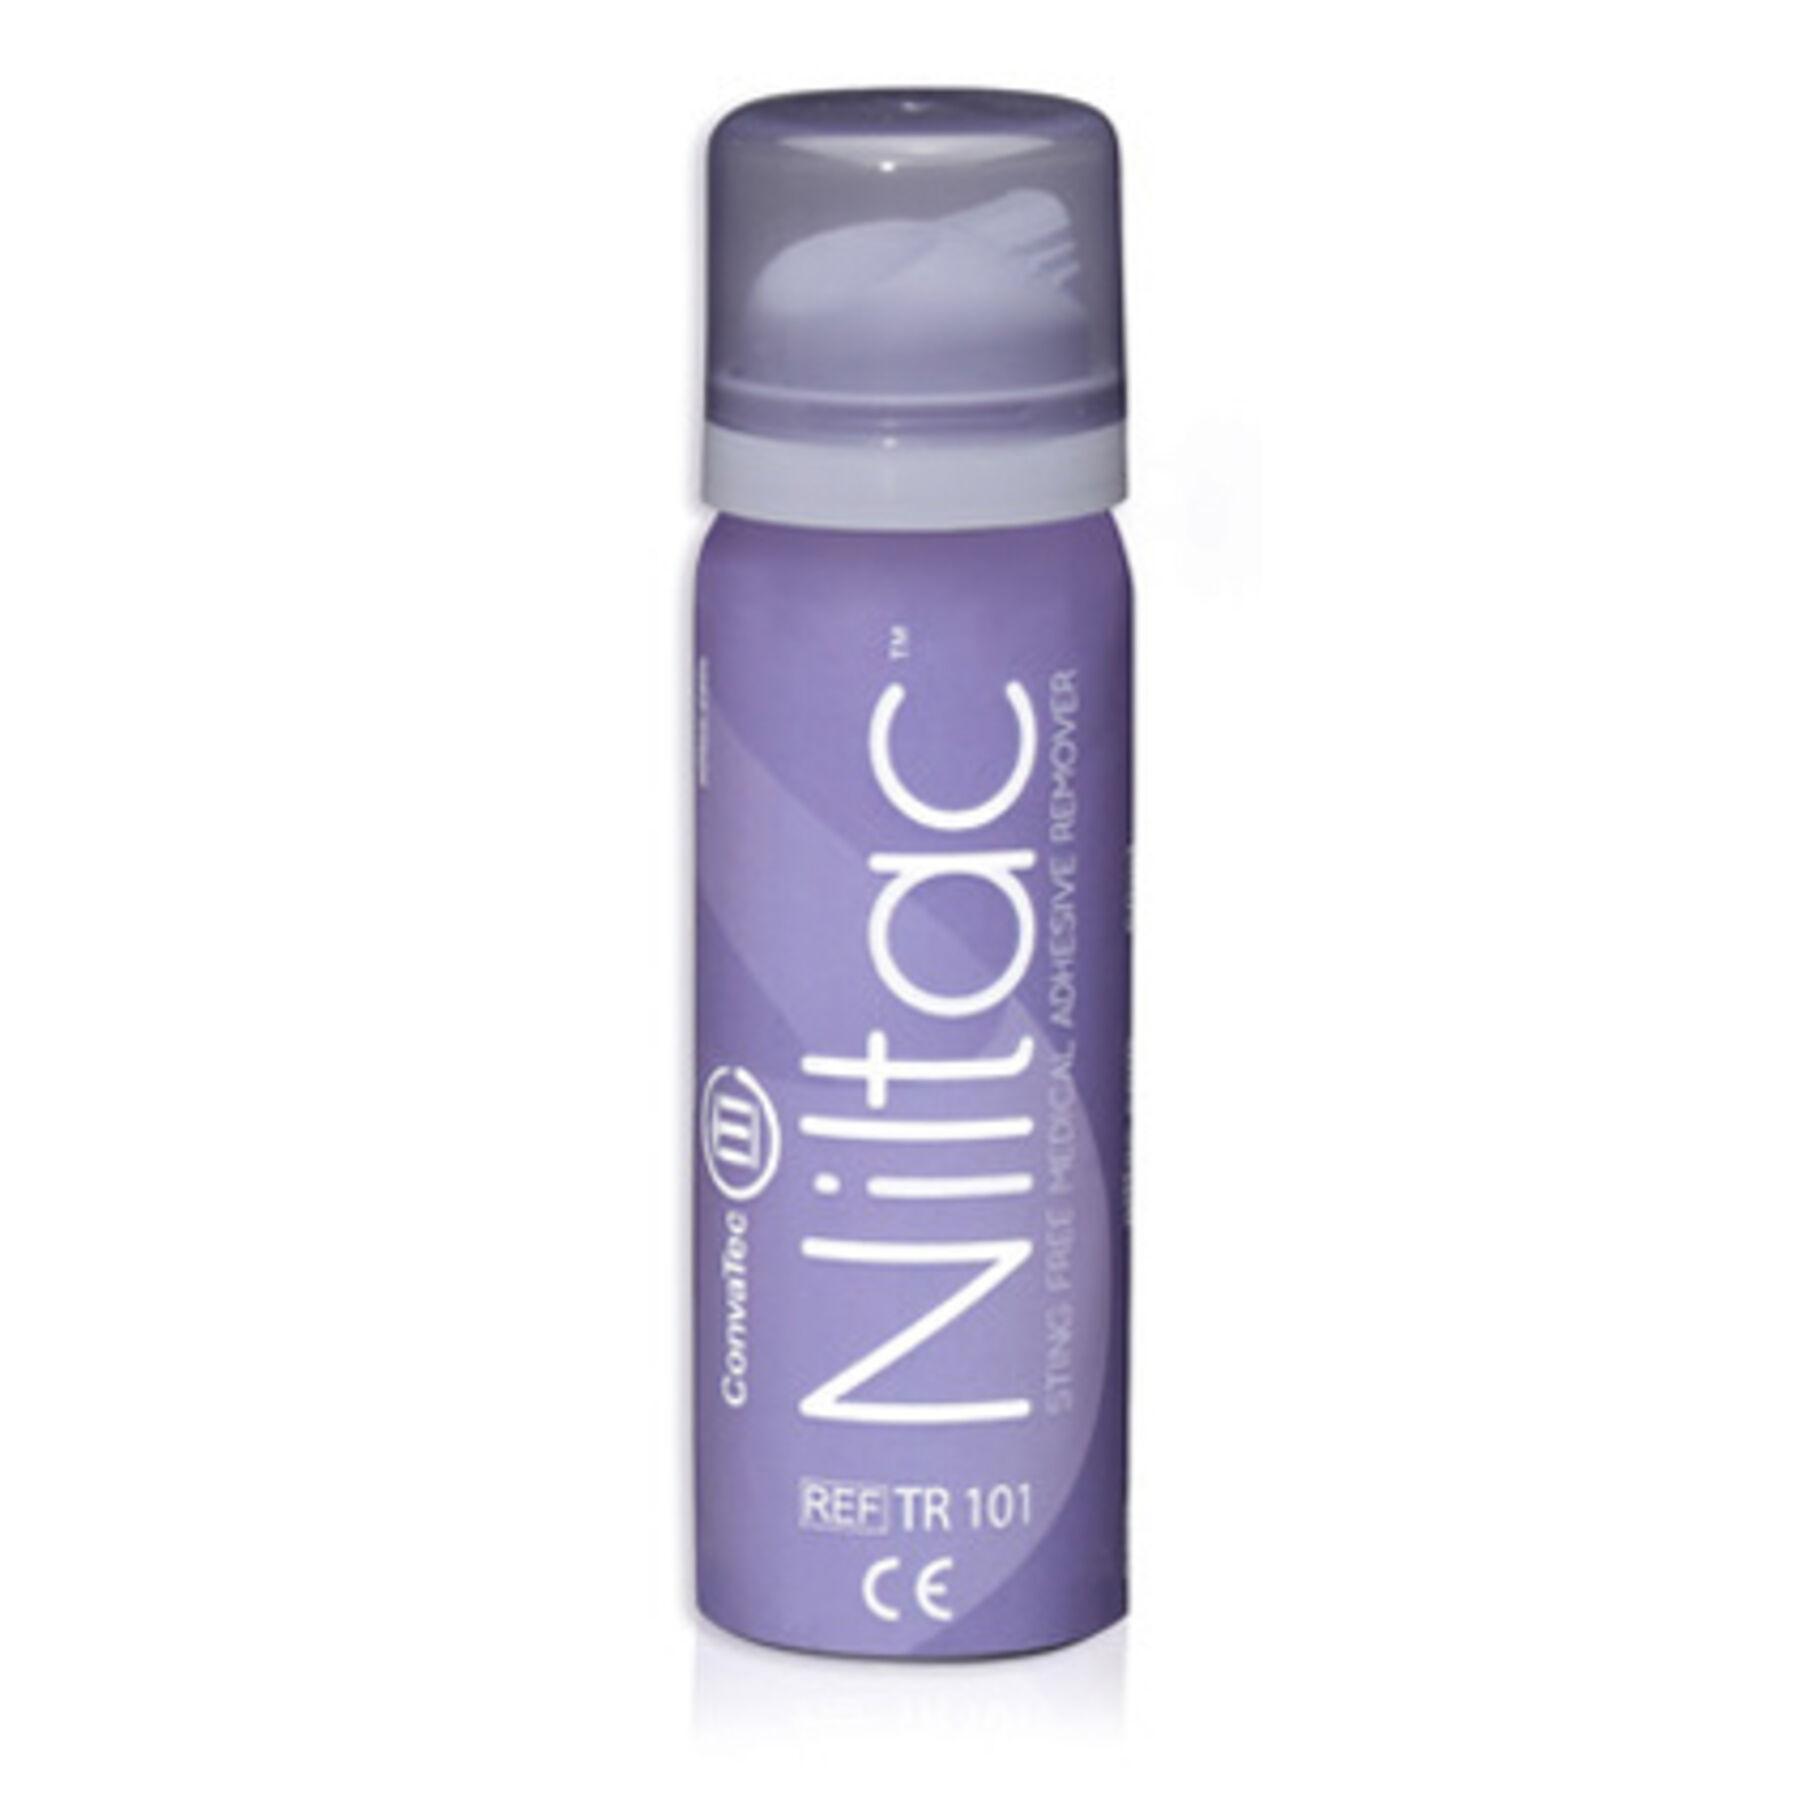 CONVATEC ITALIA Srl Niltac rimuovi adesivo spray 50 ml